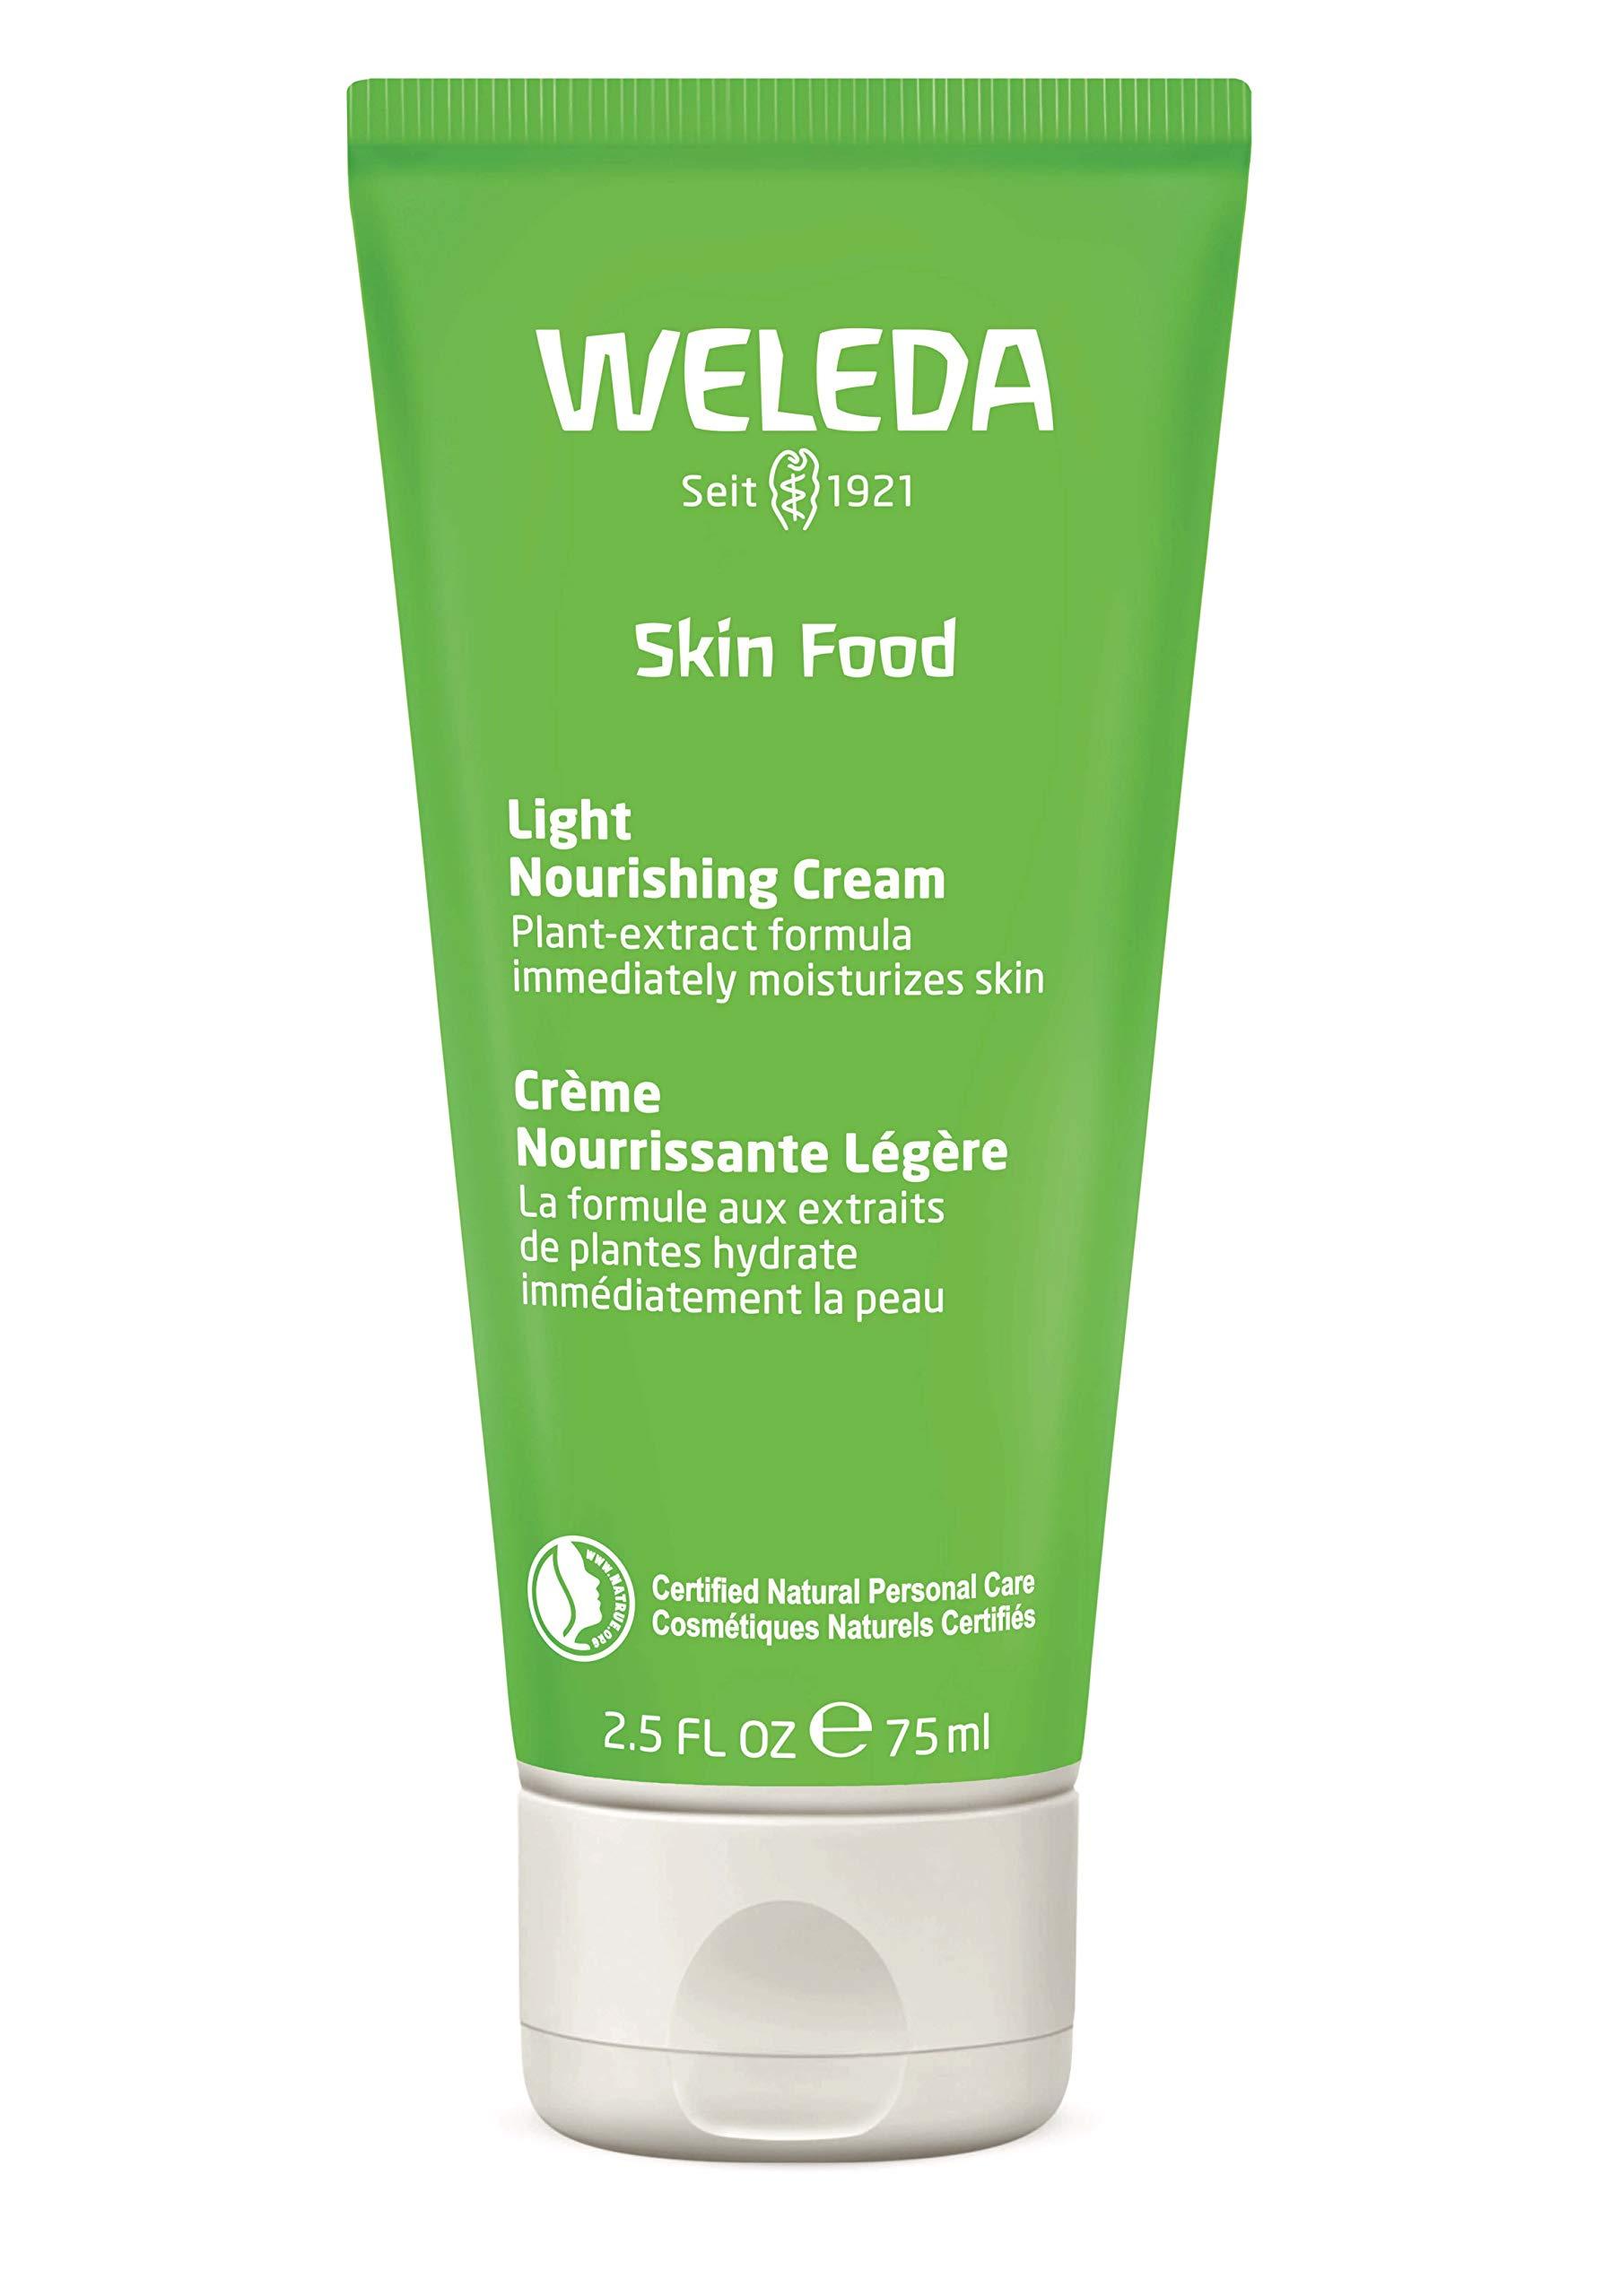 Weleda Skin Food Light Nourishing Cream, 2.5 Fluid Ounce